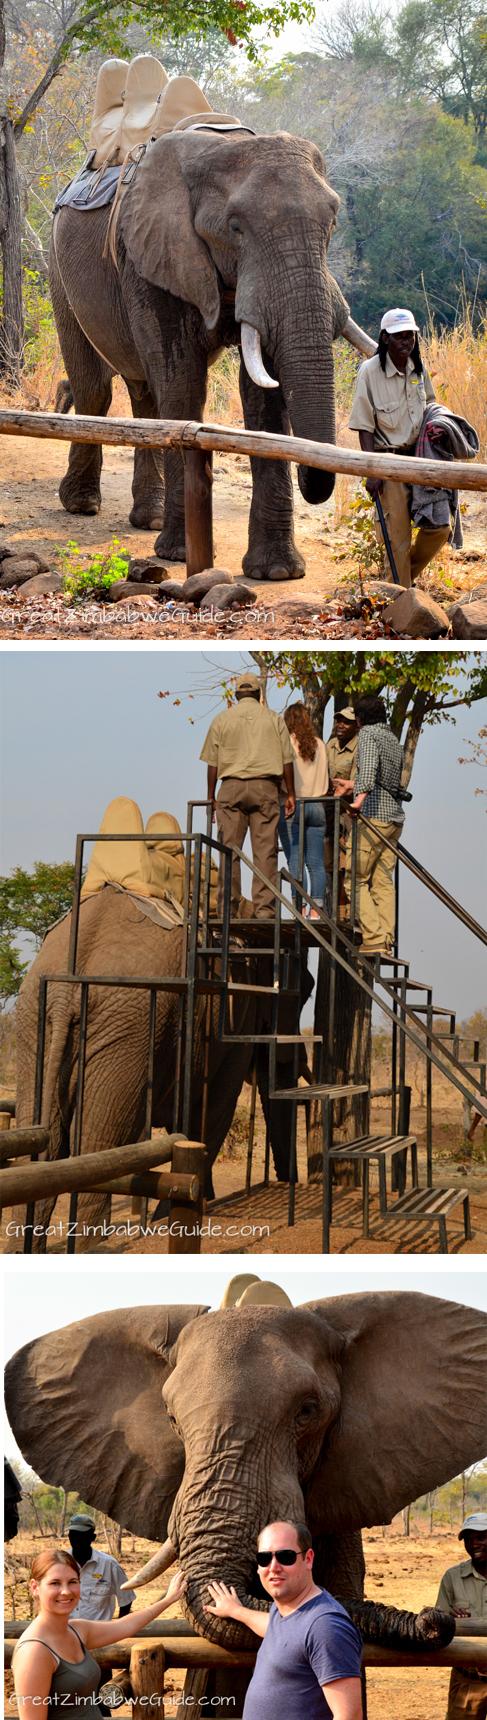 wild horizons elephant safari 123